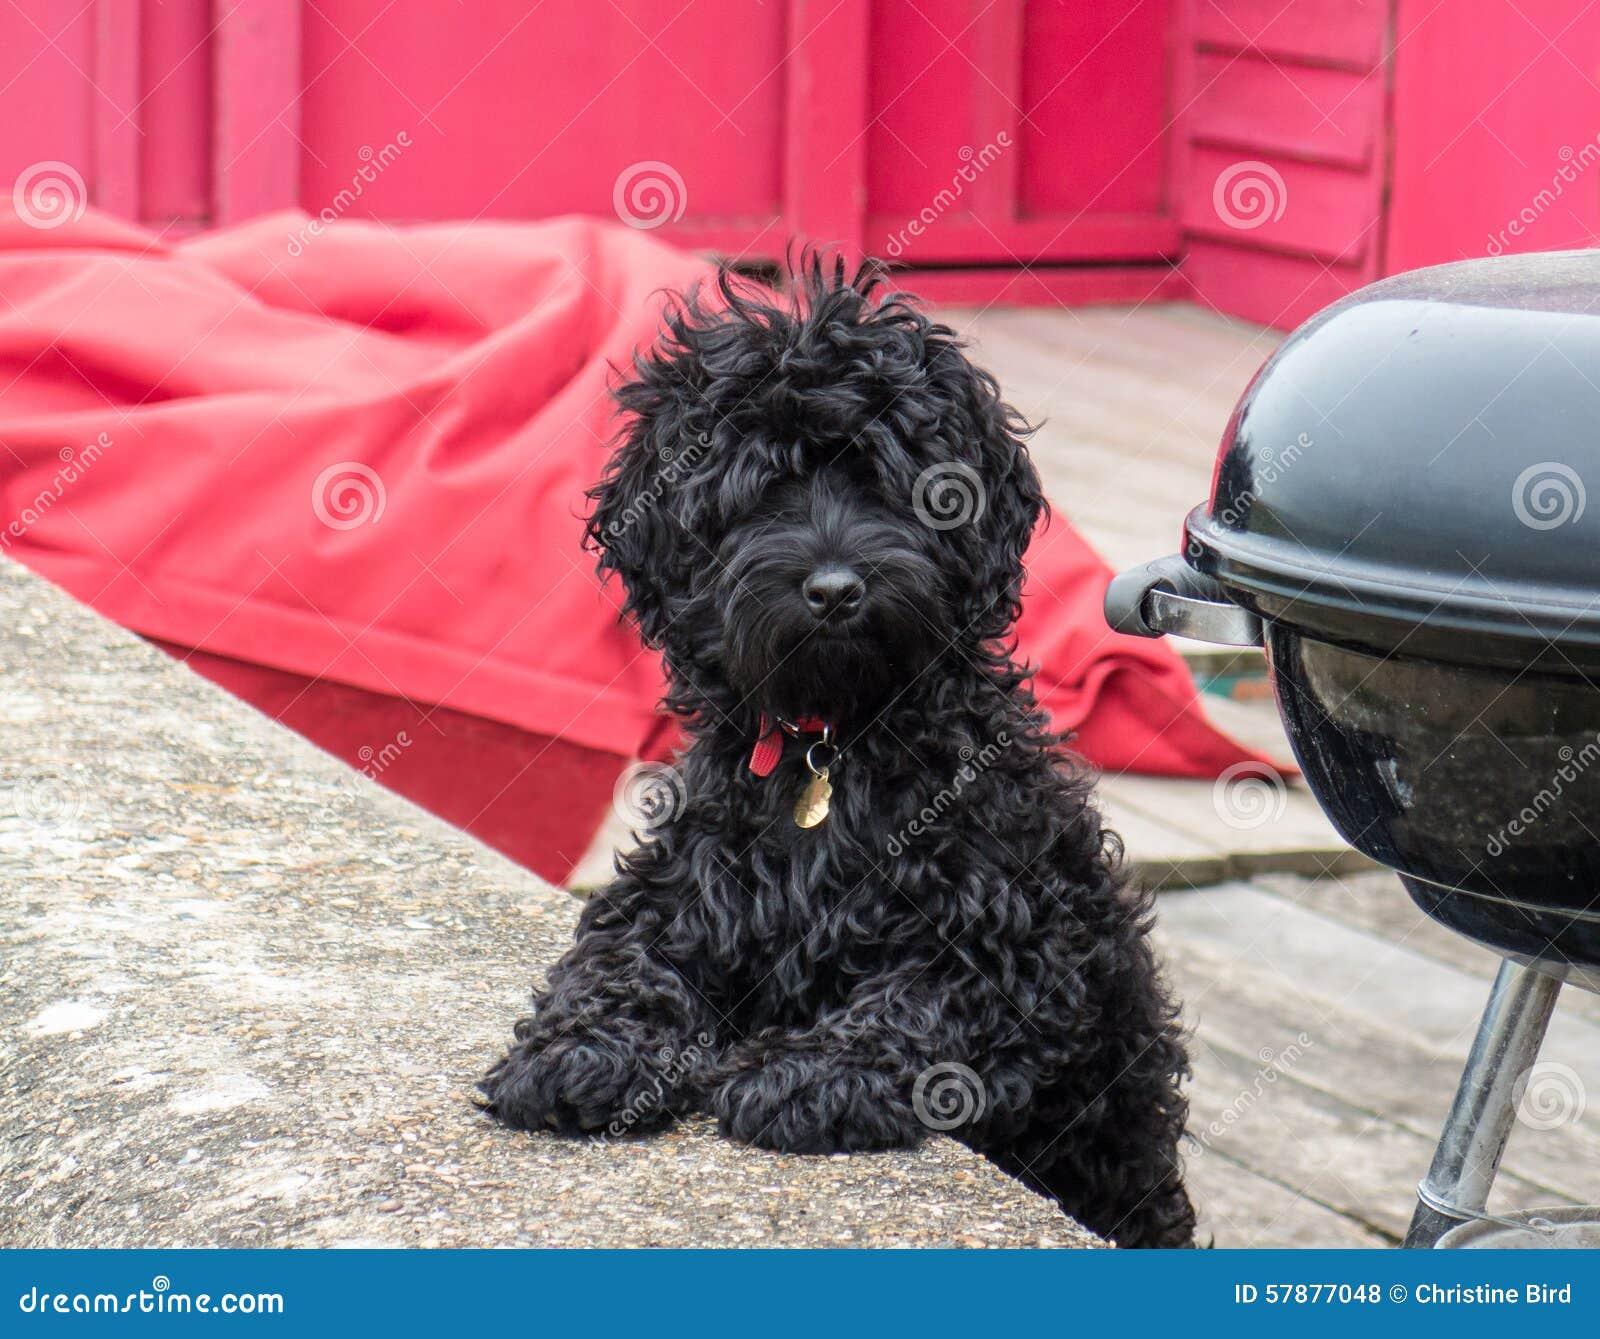 A Cute Black Fluffy Dog Looking At Camera Stock Photo ...